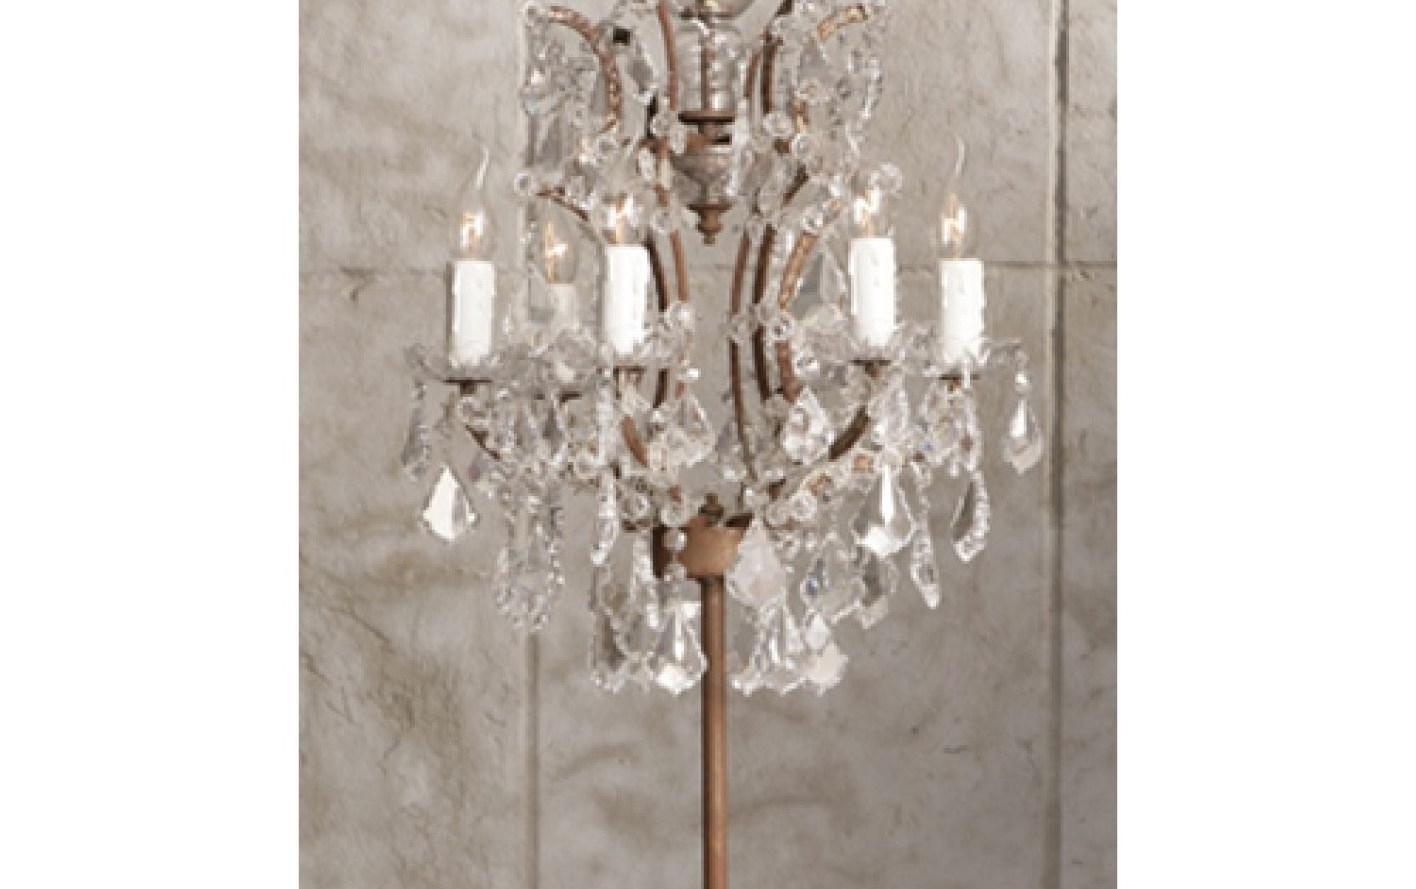 Most Popular Chandelier : Xstunning Crystal Chandelier Table Lamp Suppliers Regarding Small Crystal Chandelier Table Lamps (View 5 of 15)